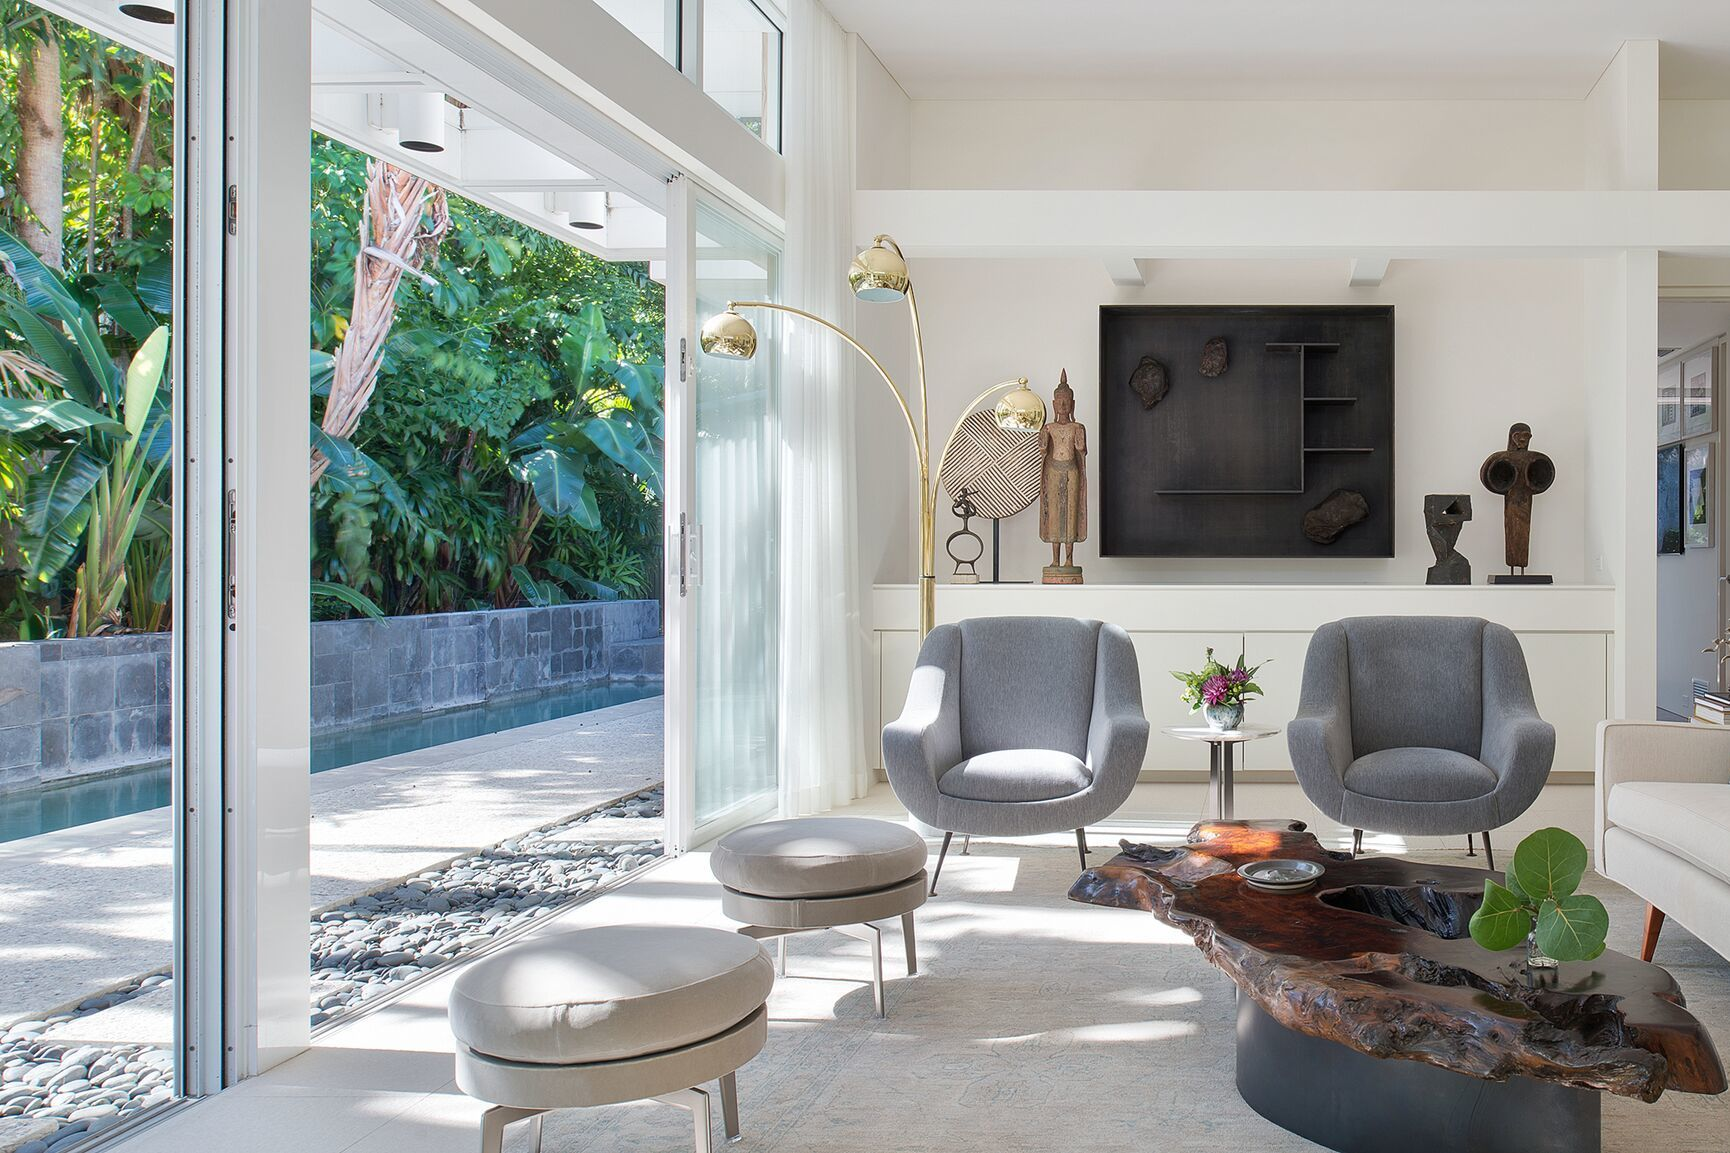 Ellen hanson living room utv1zy